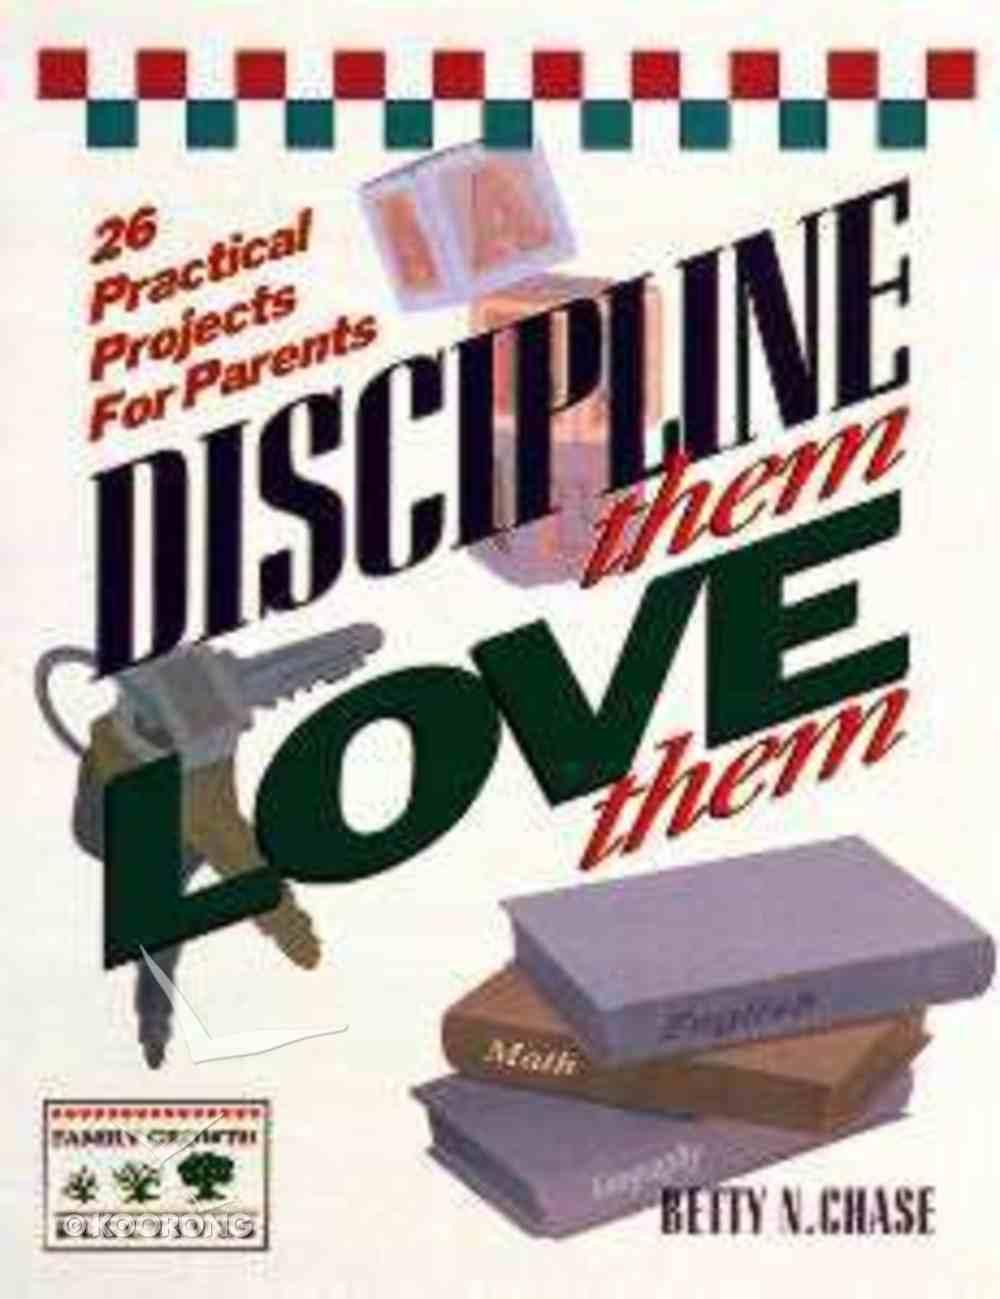 Family Growth Electives: Discipline Them, Love Them Paperback